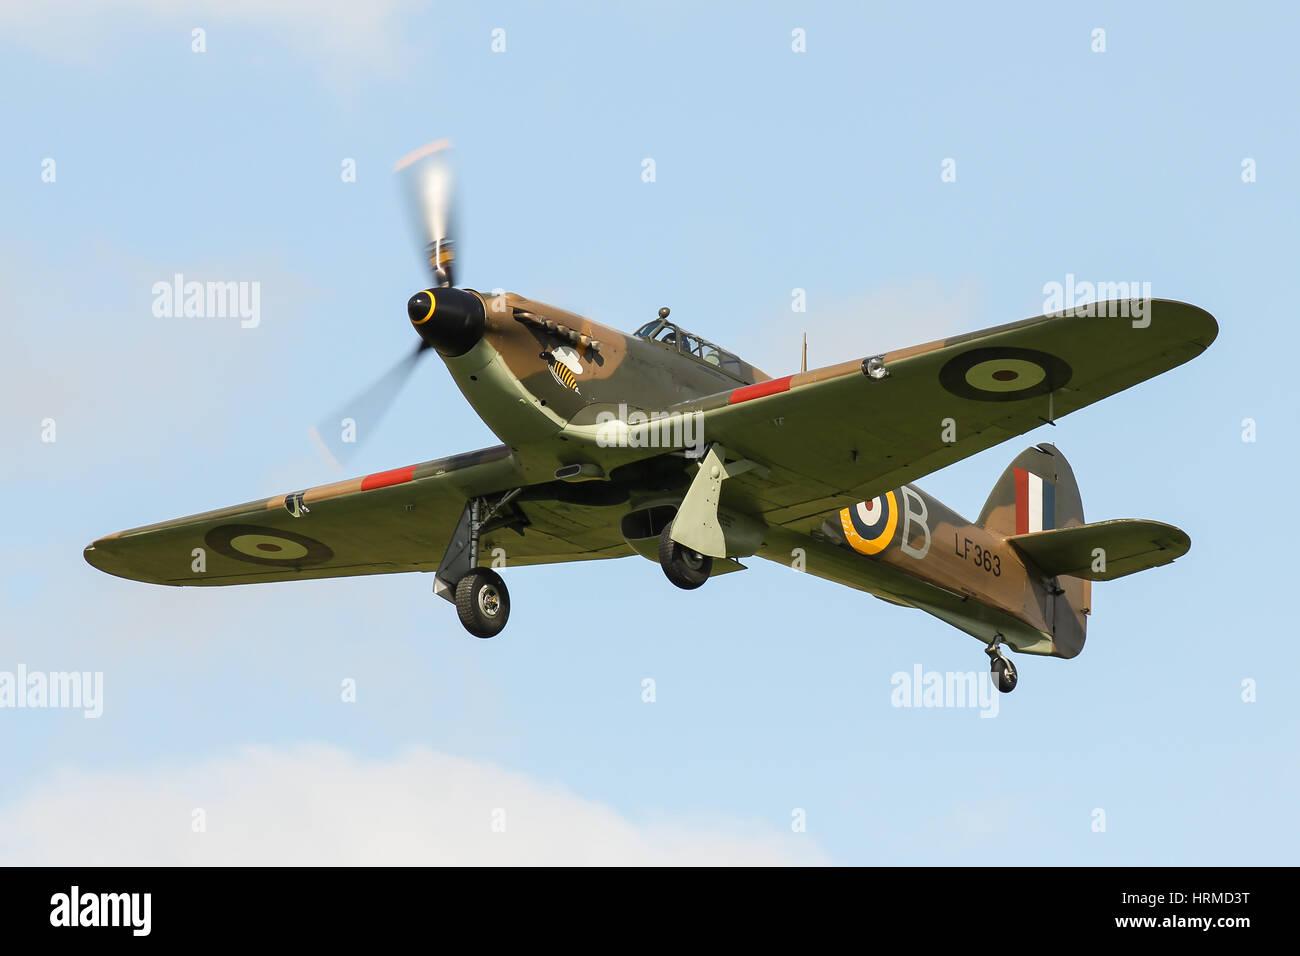 Battle of Britain Memorial Flight Hawker Hurricane MK IIc LF363 gets airborne from Goodwood Aerodrome, UK - Stock Image